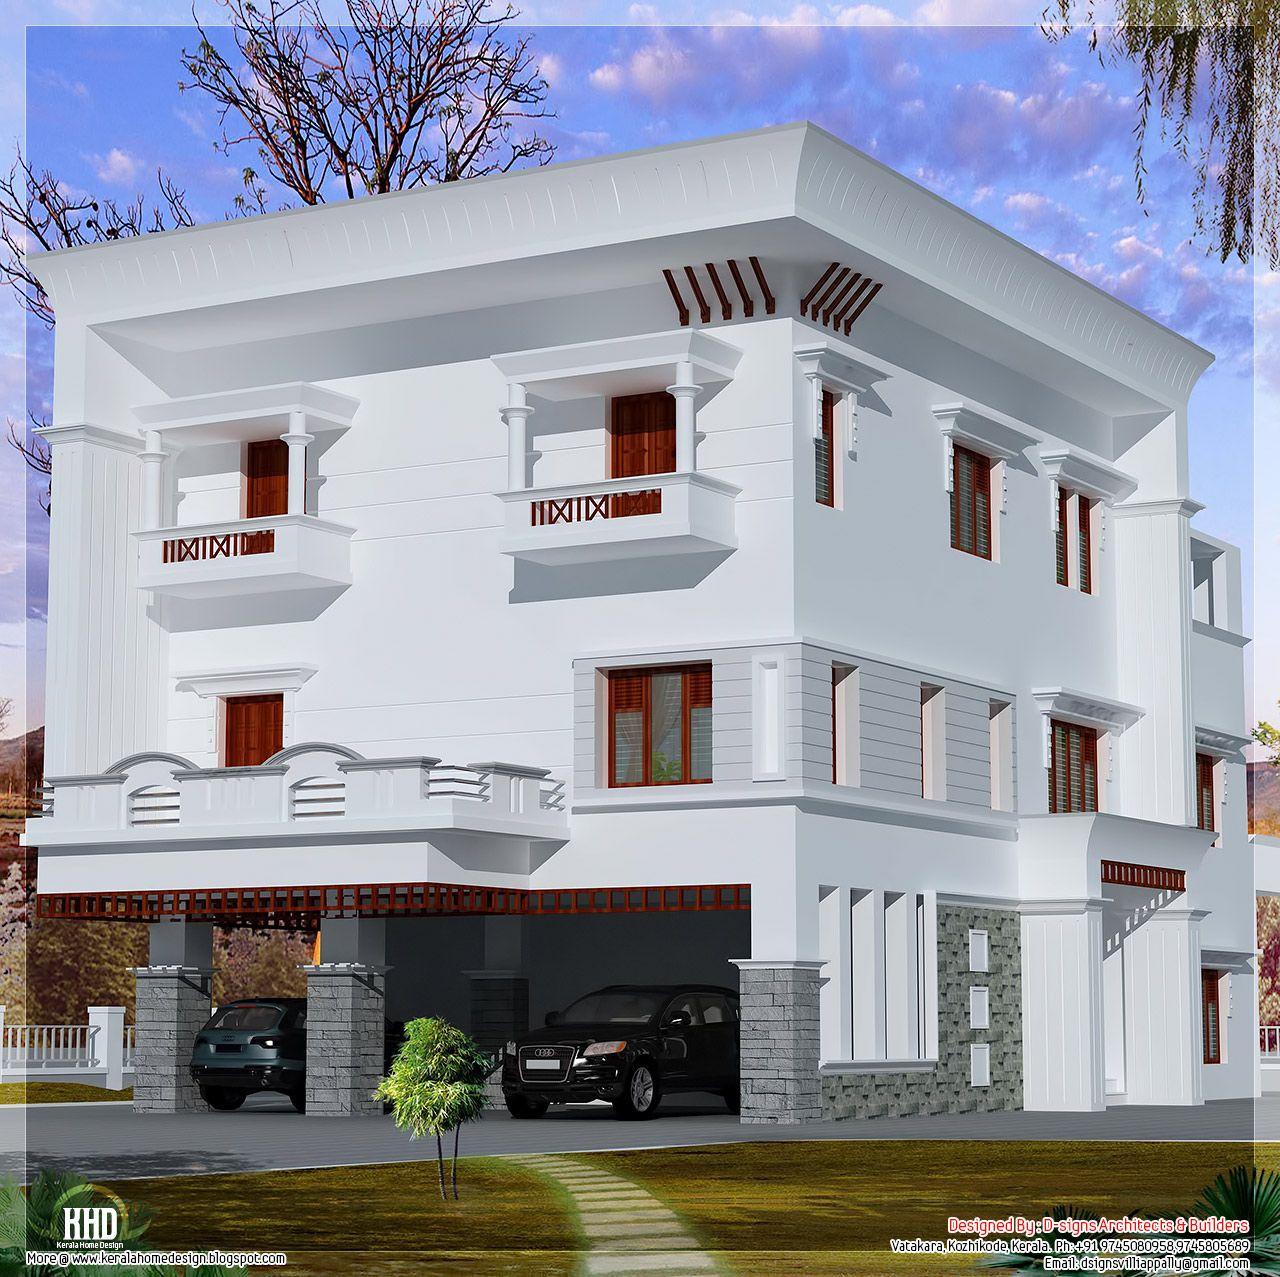 Einfaches hausdesign 2018  storey house plans australia  hiqra  pinterest  house plans